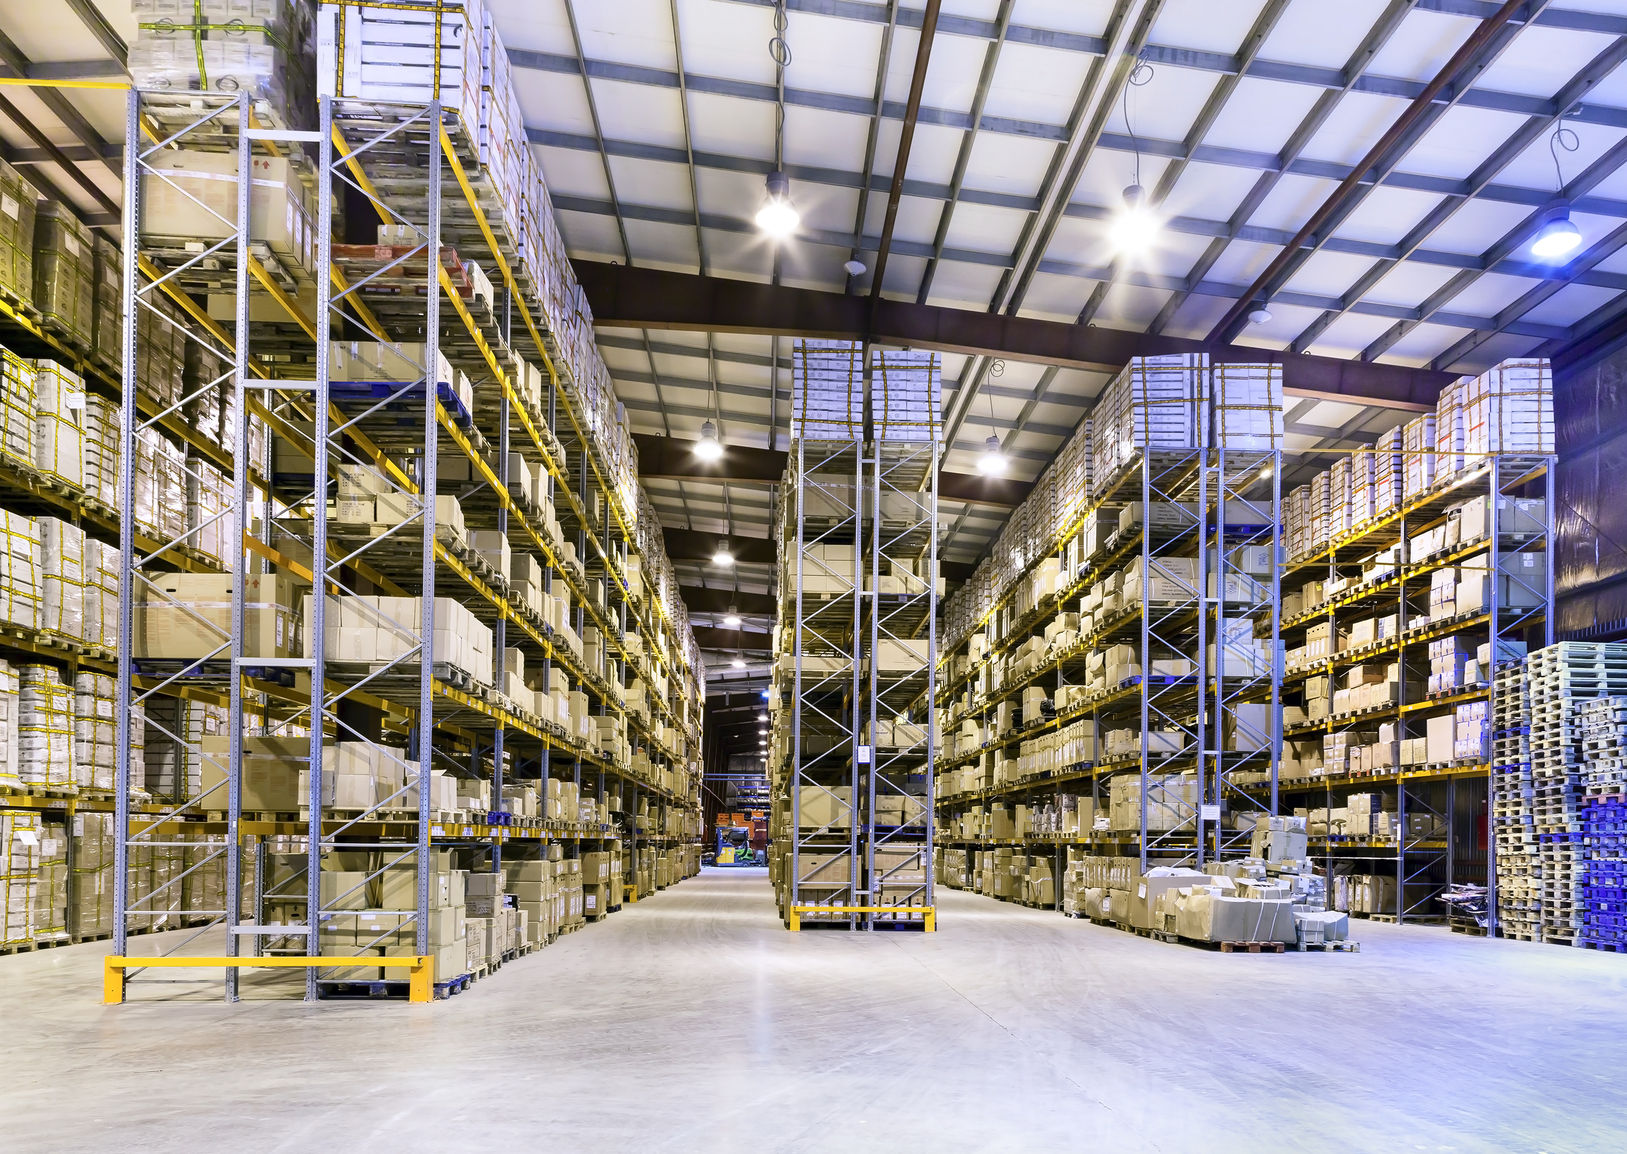 instalaciones eléctricas Instalaciones Eléctricas 24209298 ml